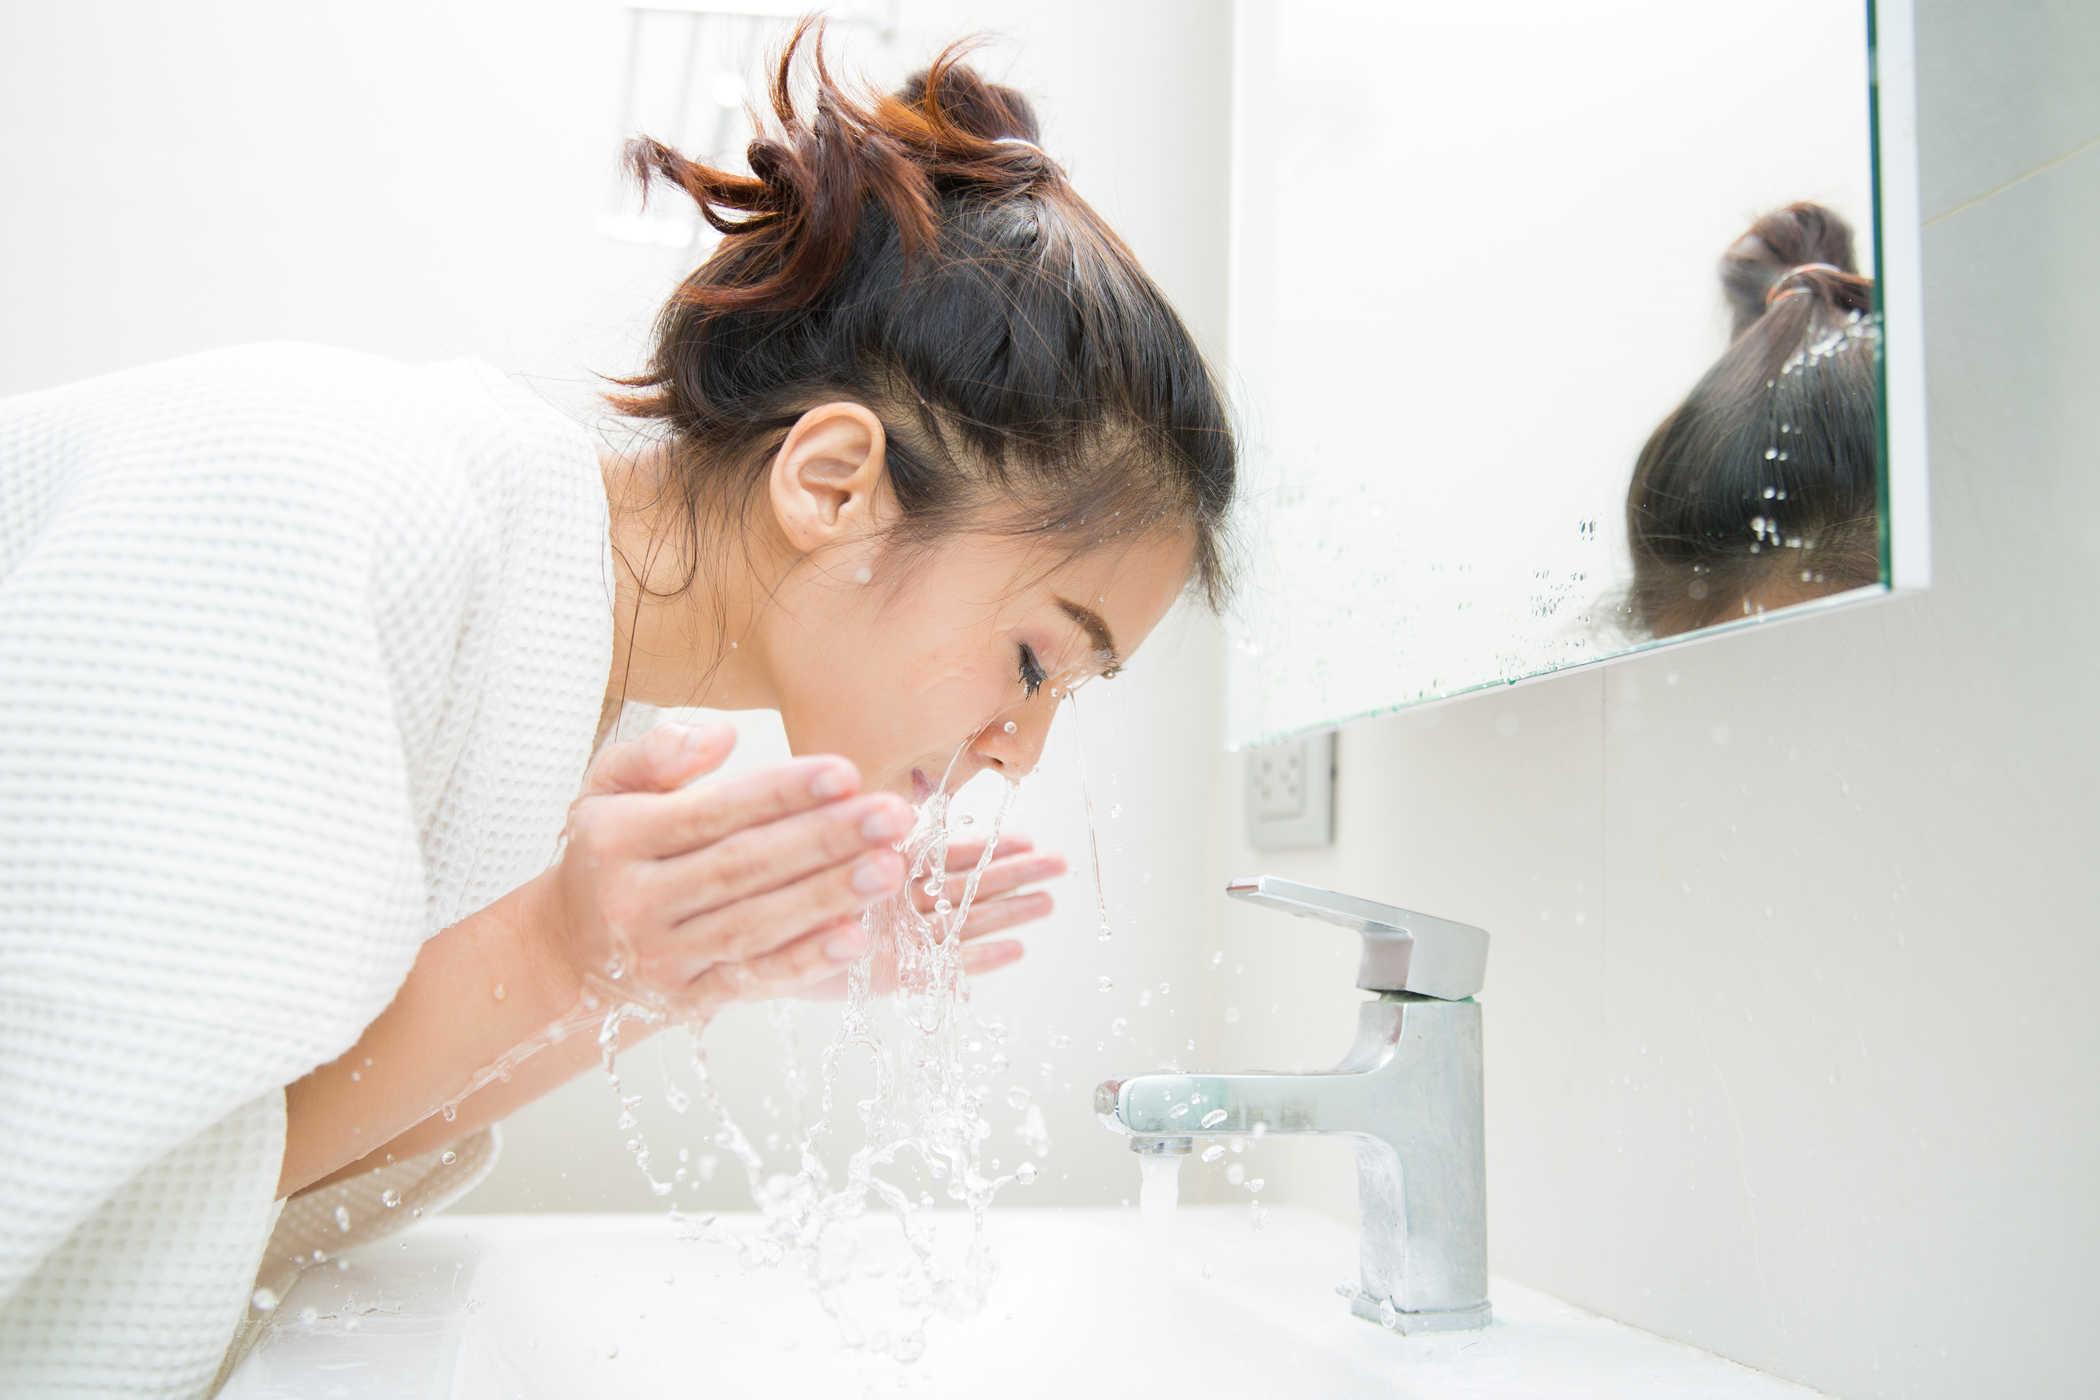 vệ sinh da mặt sạch sâu